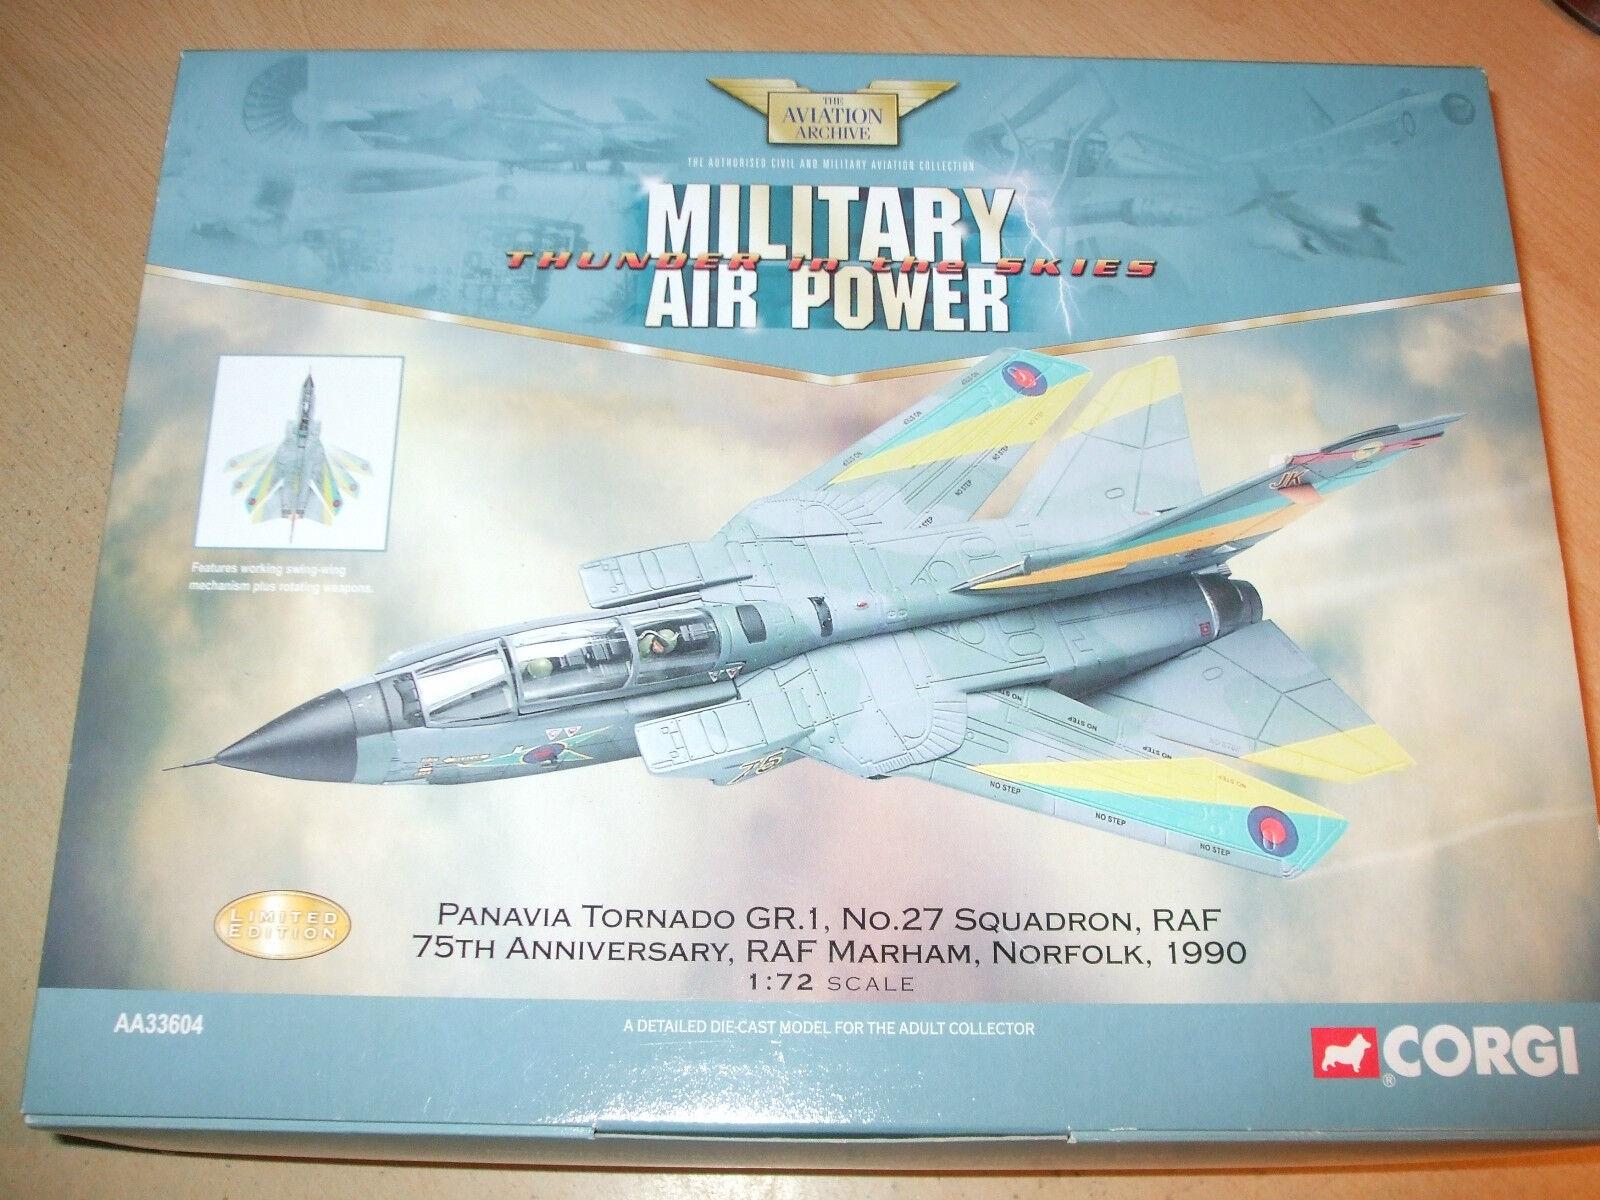 Corgi - Panavia Tornado GR.1, No.27 Sqn - RAF 75th Anniversary - 1.72 - AA33604